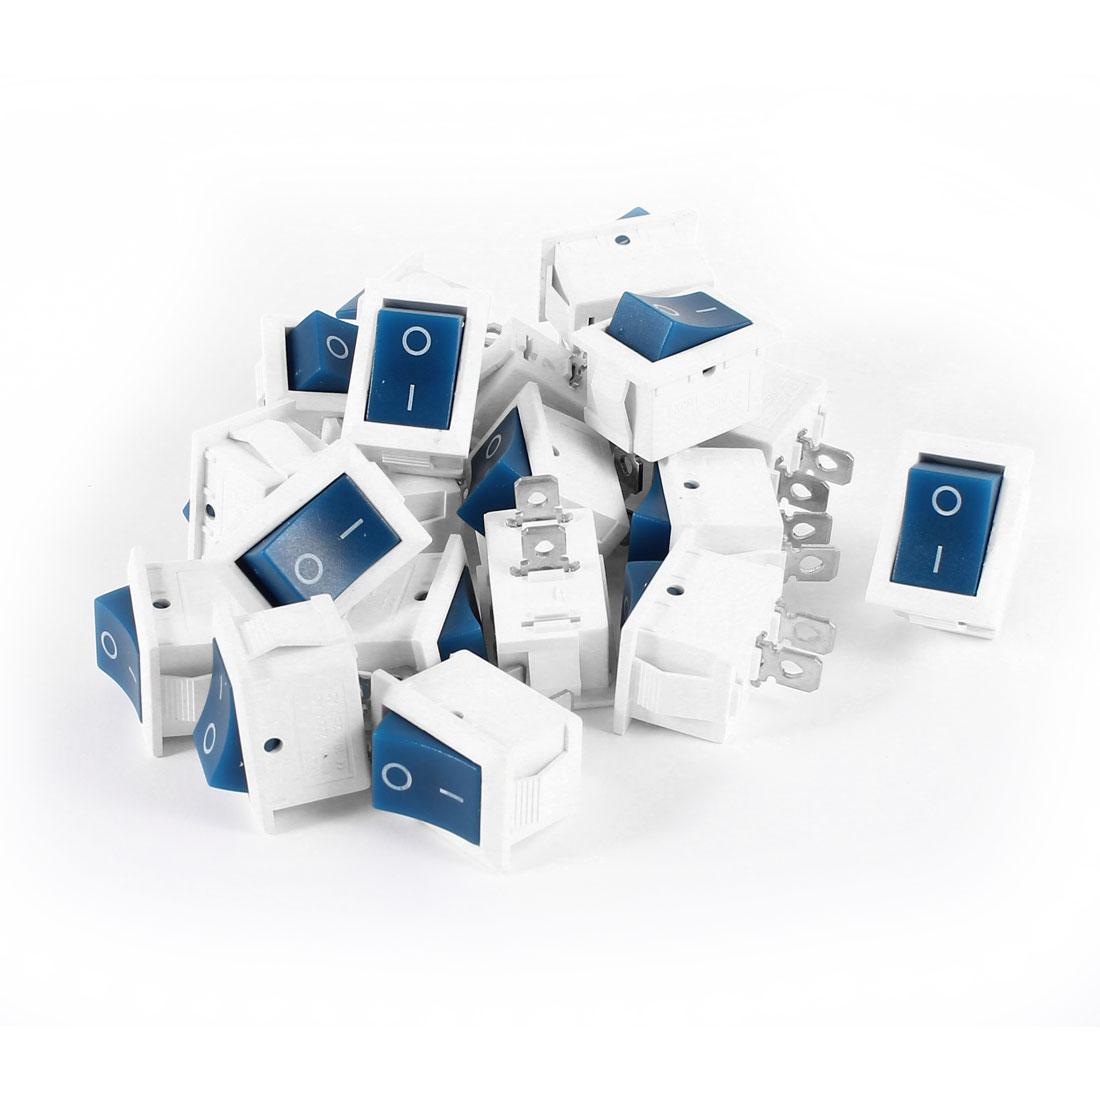 20 Pcs KCD1 AC 250V 6A 125V 10A 2Pin SPST Power ON/OFF Panel Mount Rocker Switch Blue White